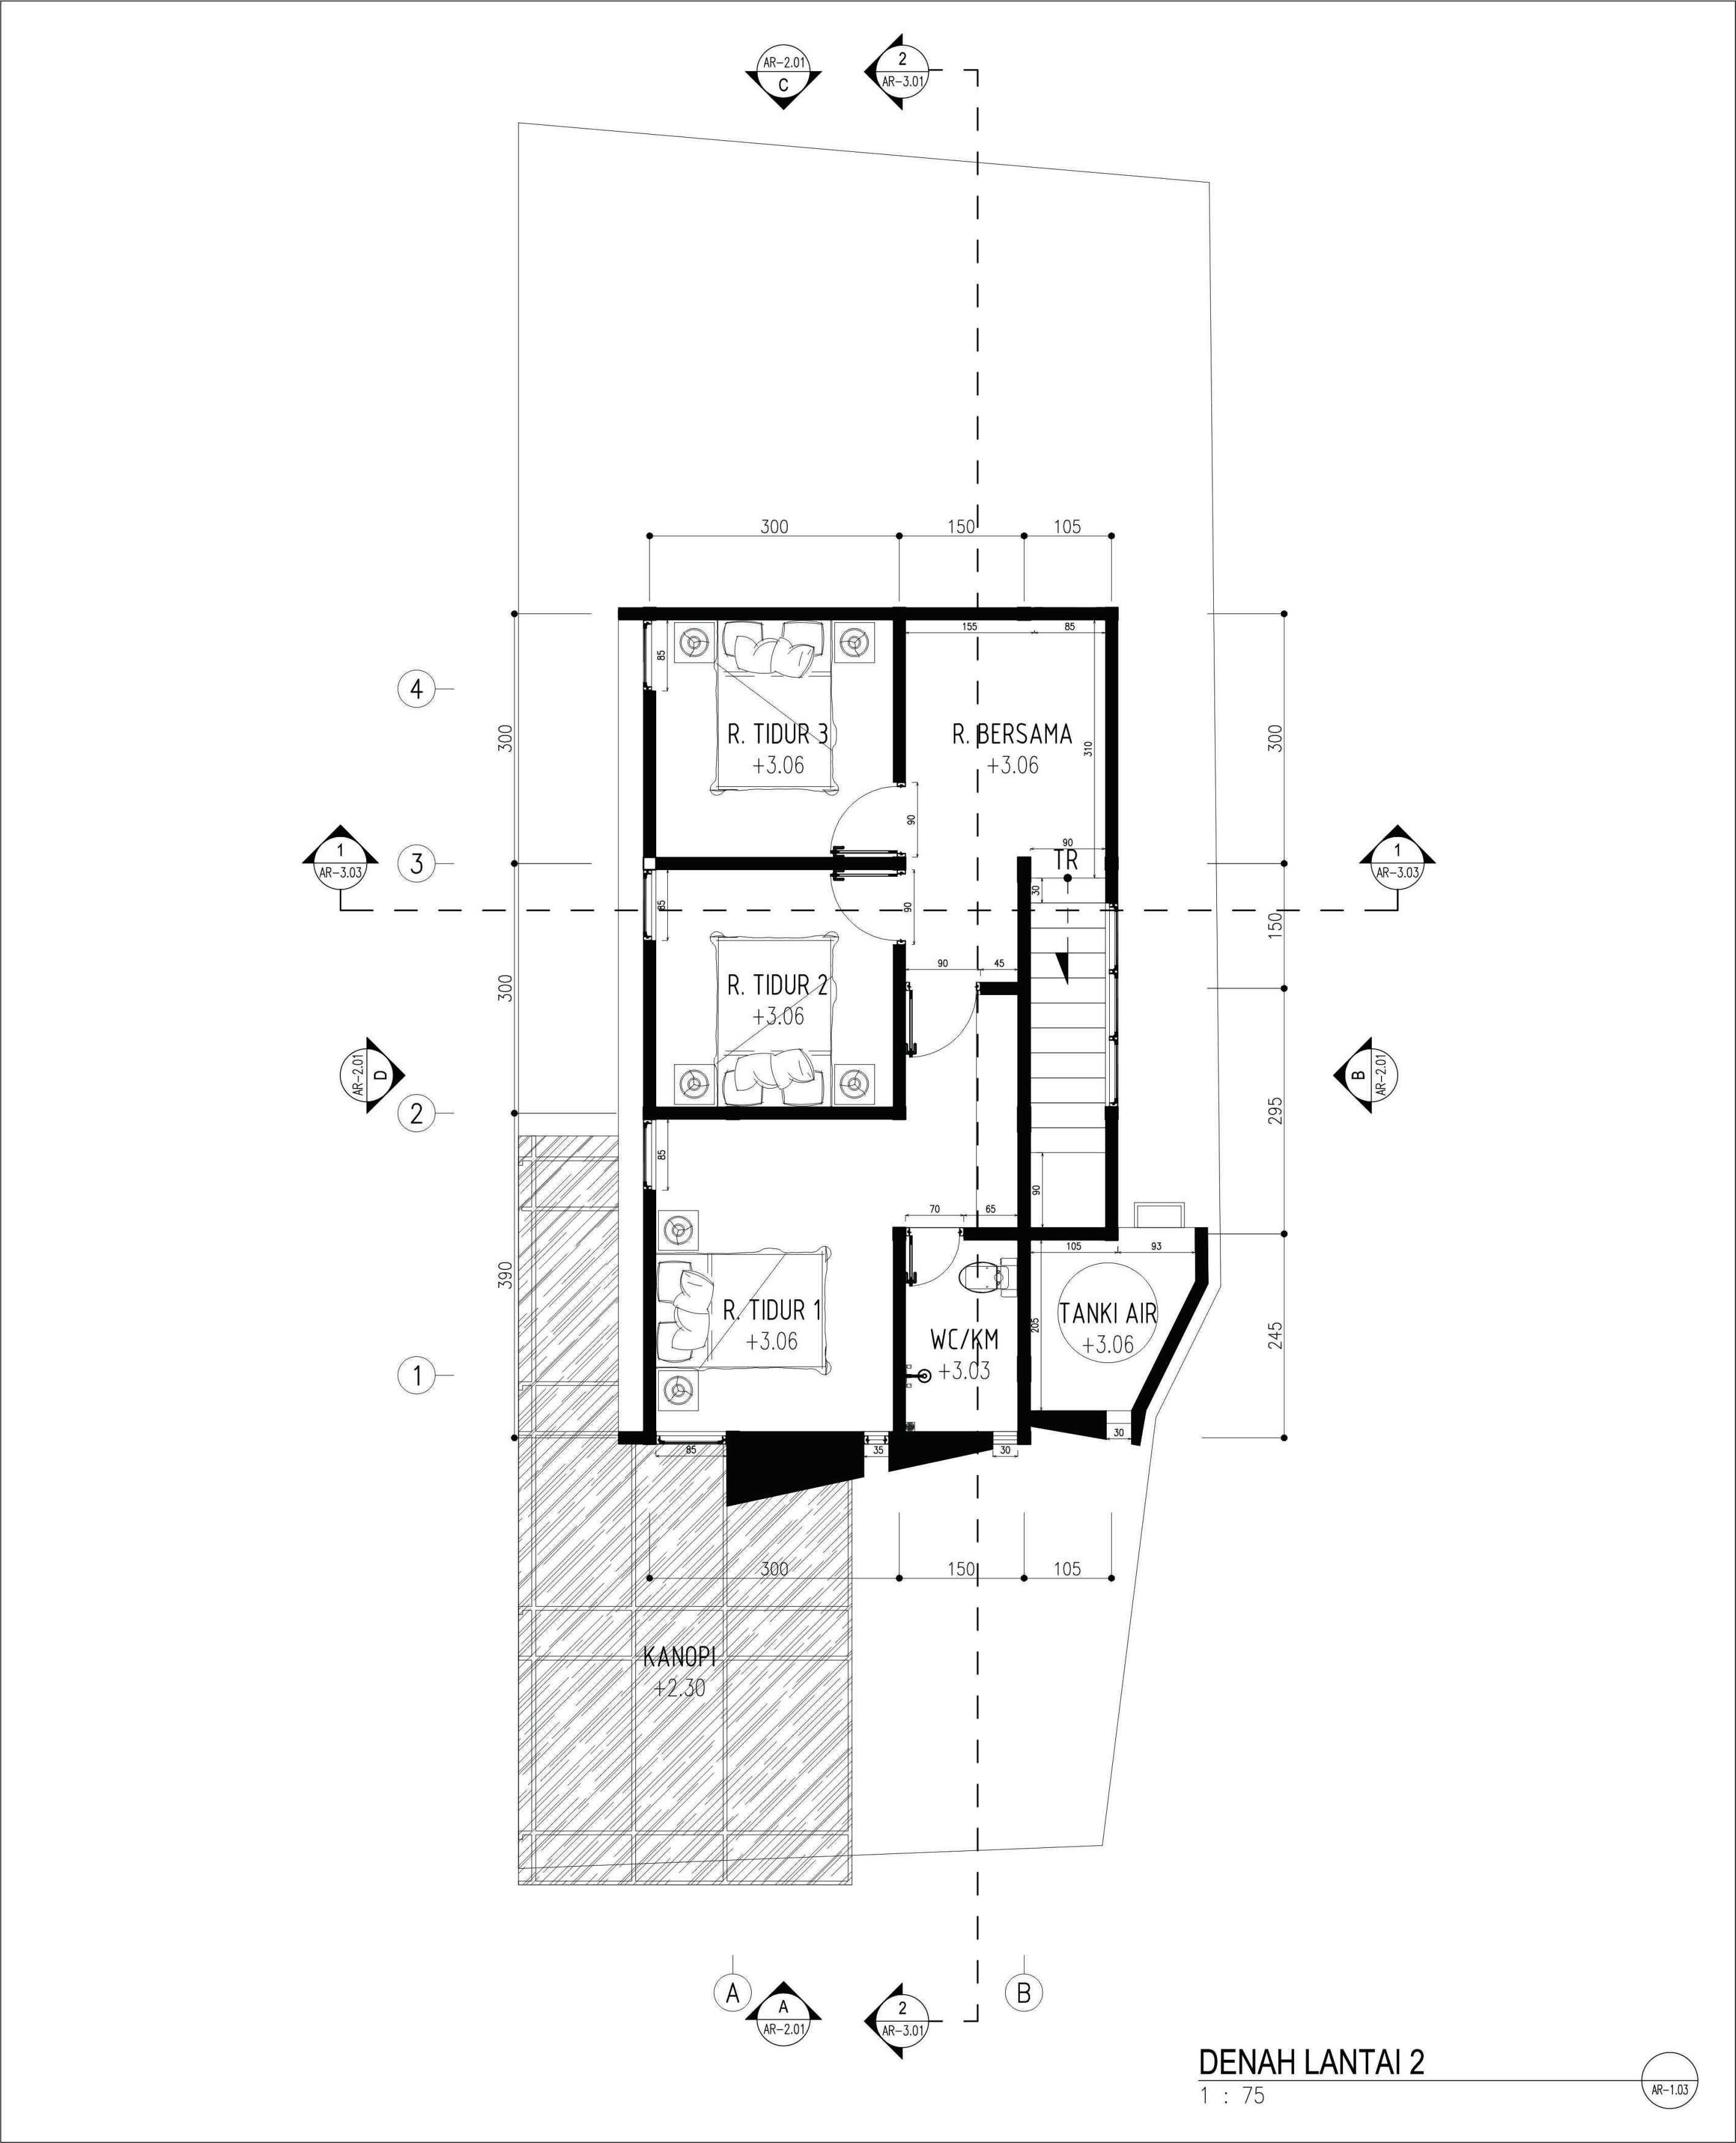 Gubah Ruang Rr House Bandung, Kota Bandung, Jawa Barat, Indonesia Bandung, Kota Bandung, Jawa Barat, Indonesia Floorplan Modern  51351